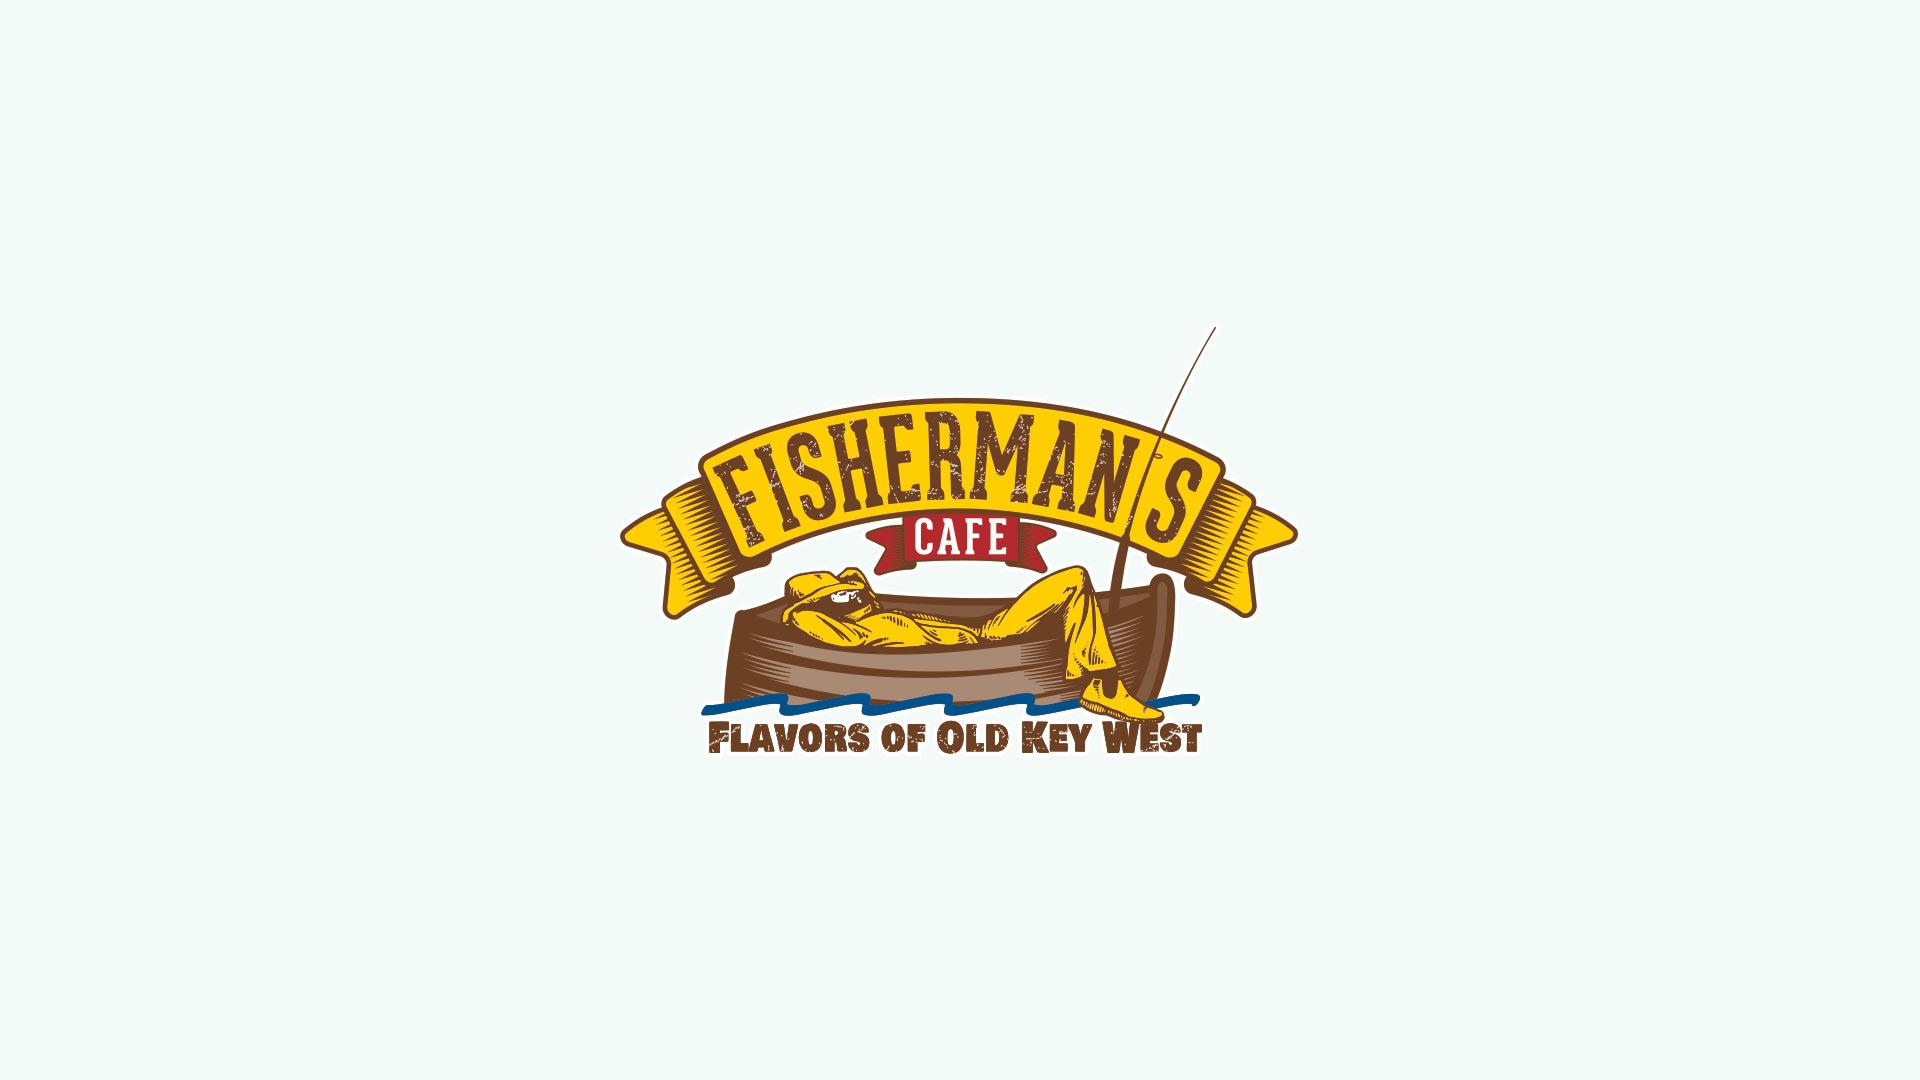 Fisherman's Cafe logo